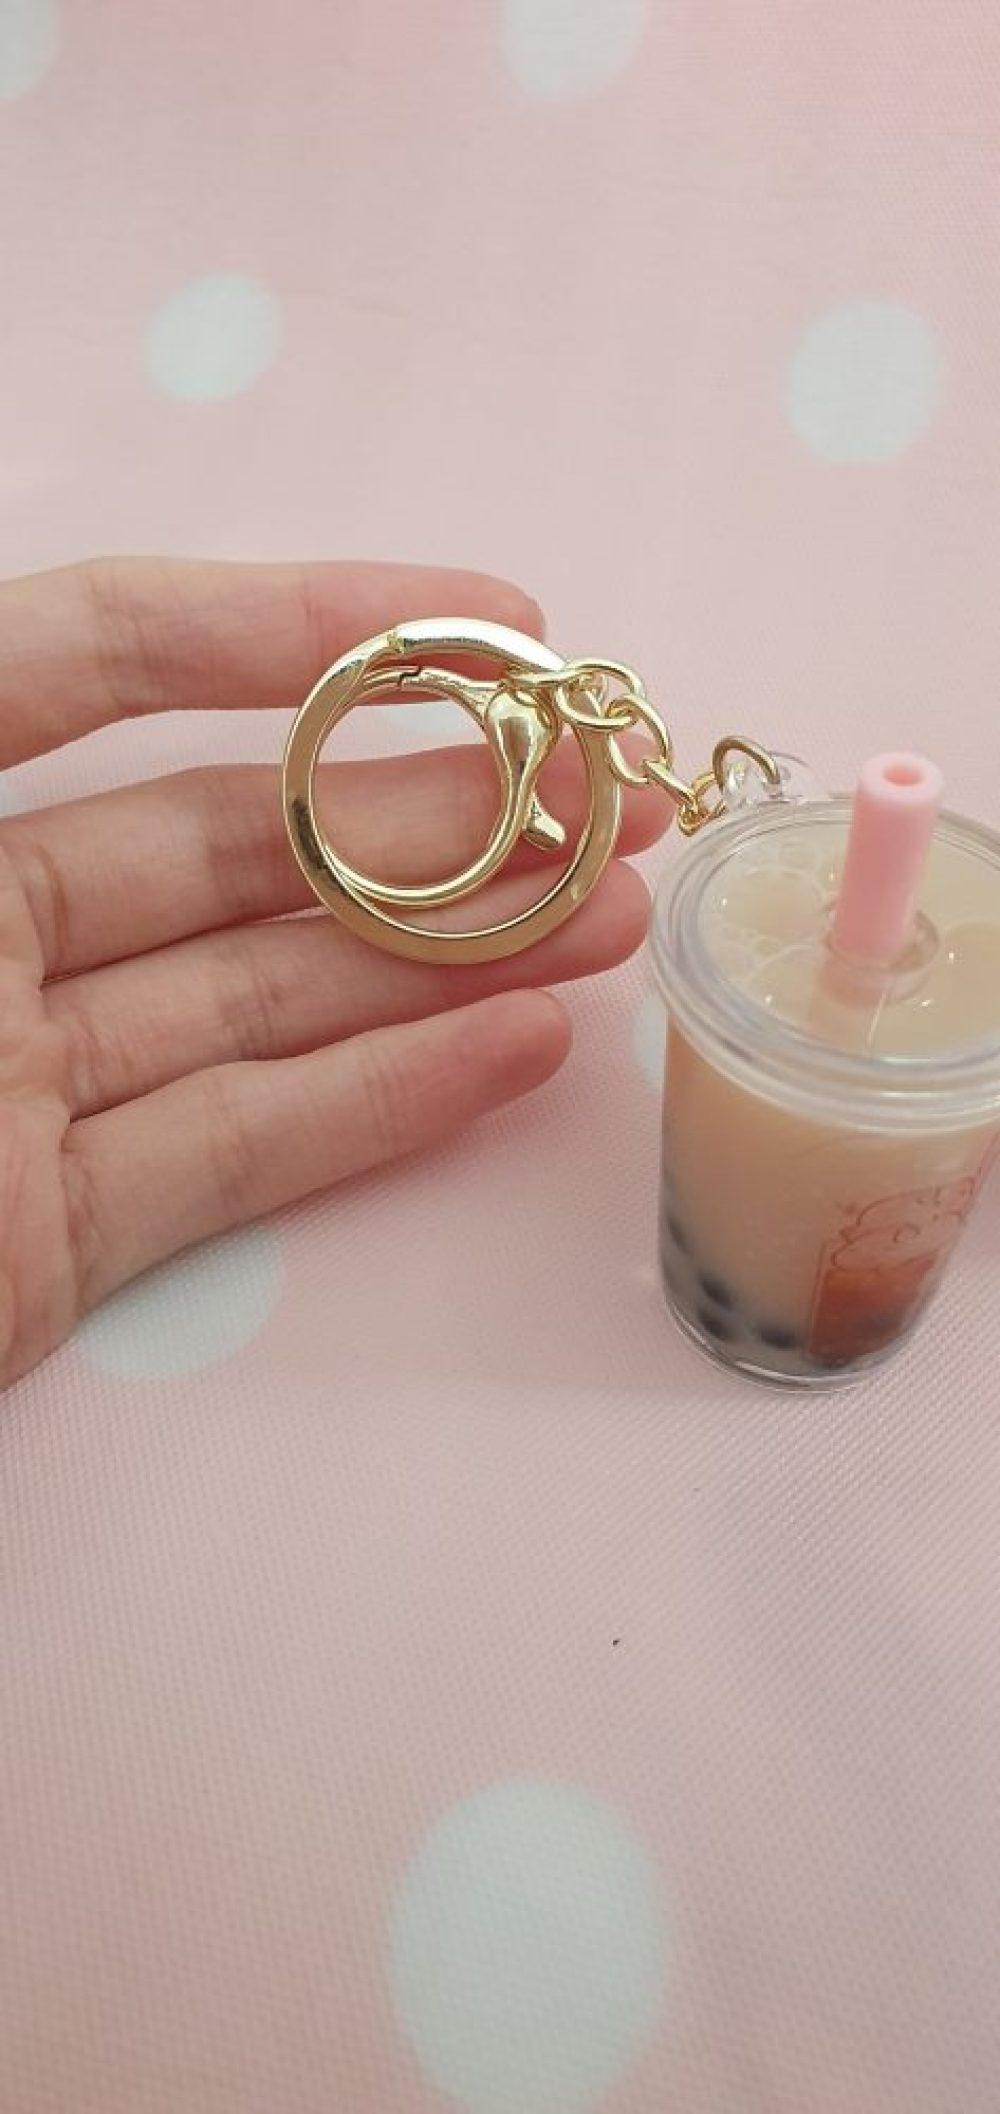 Boba tea milk tea kawaii liquid charm keychain tapioca pearls